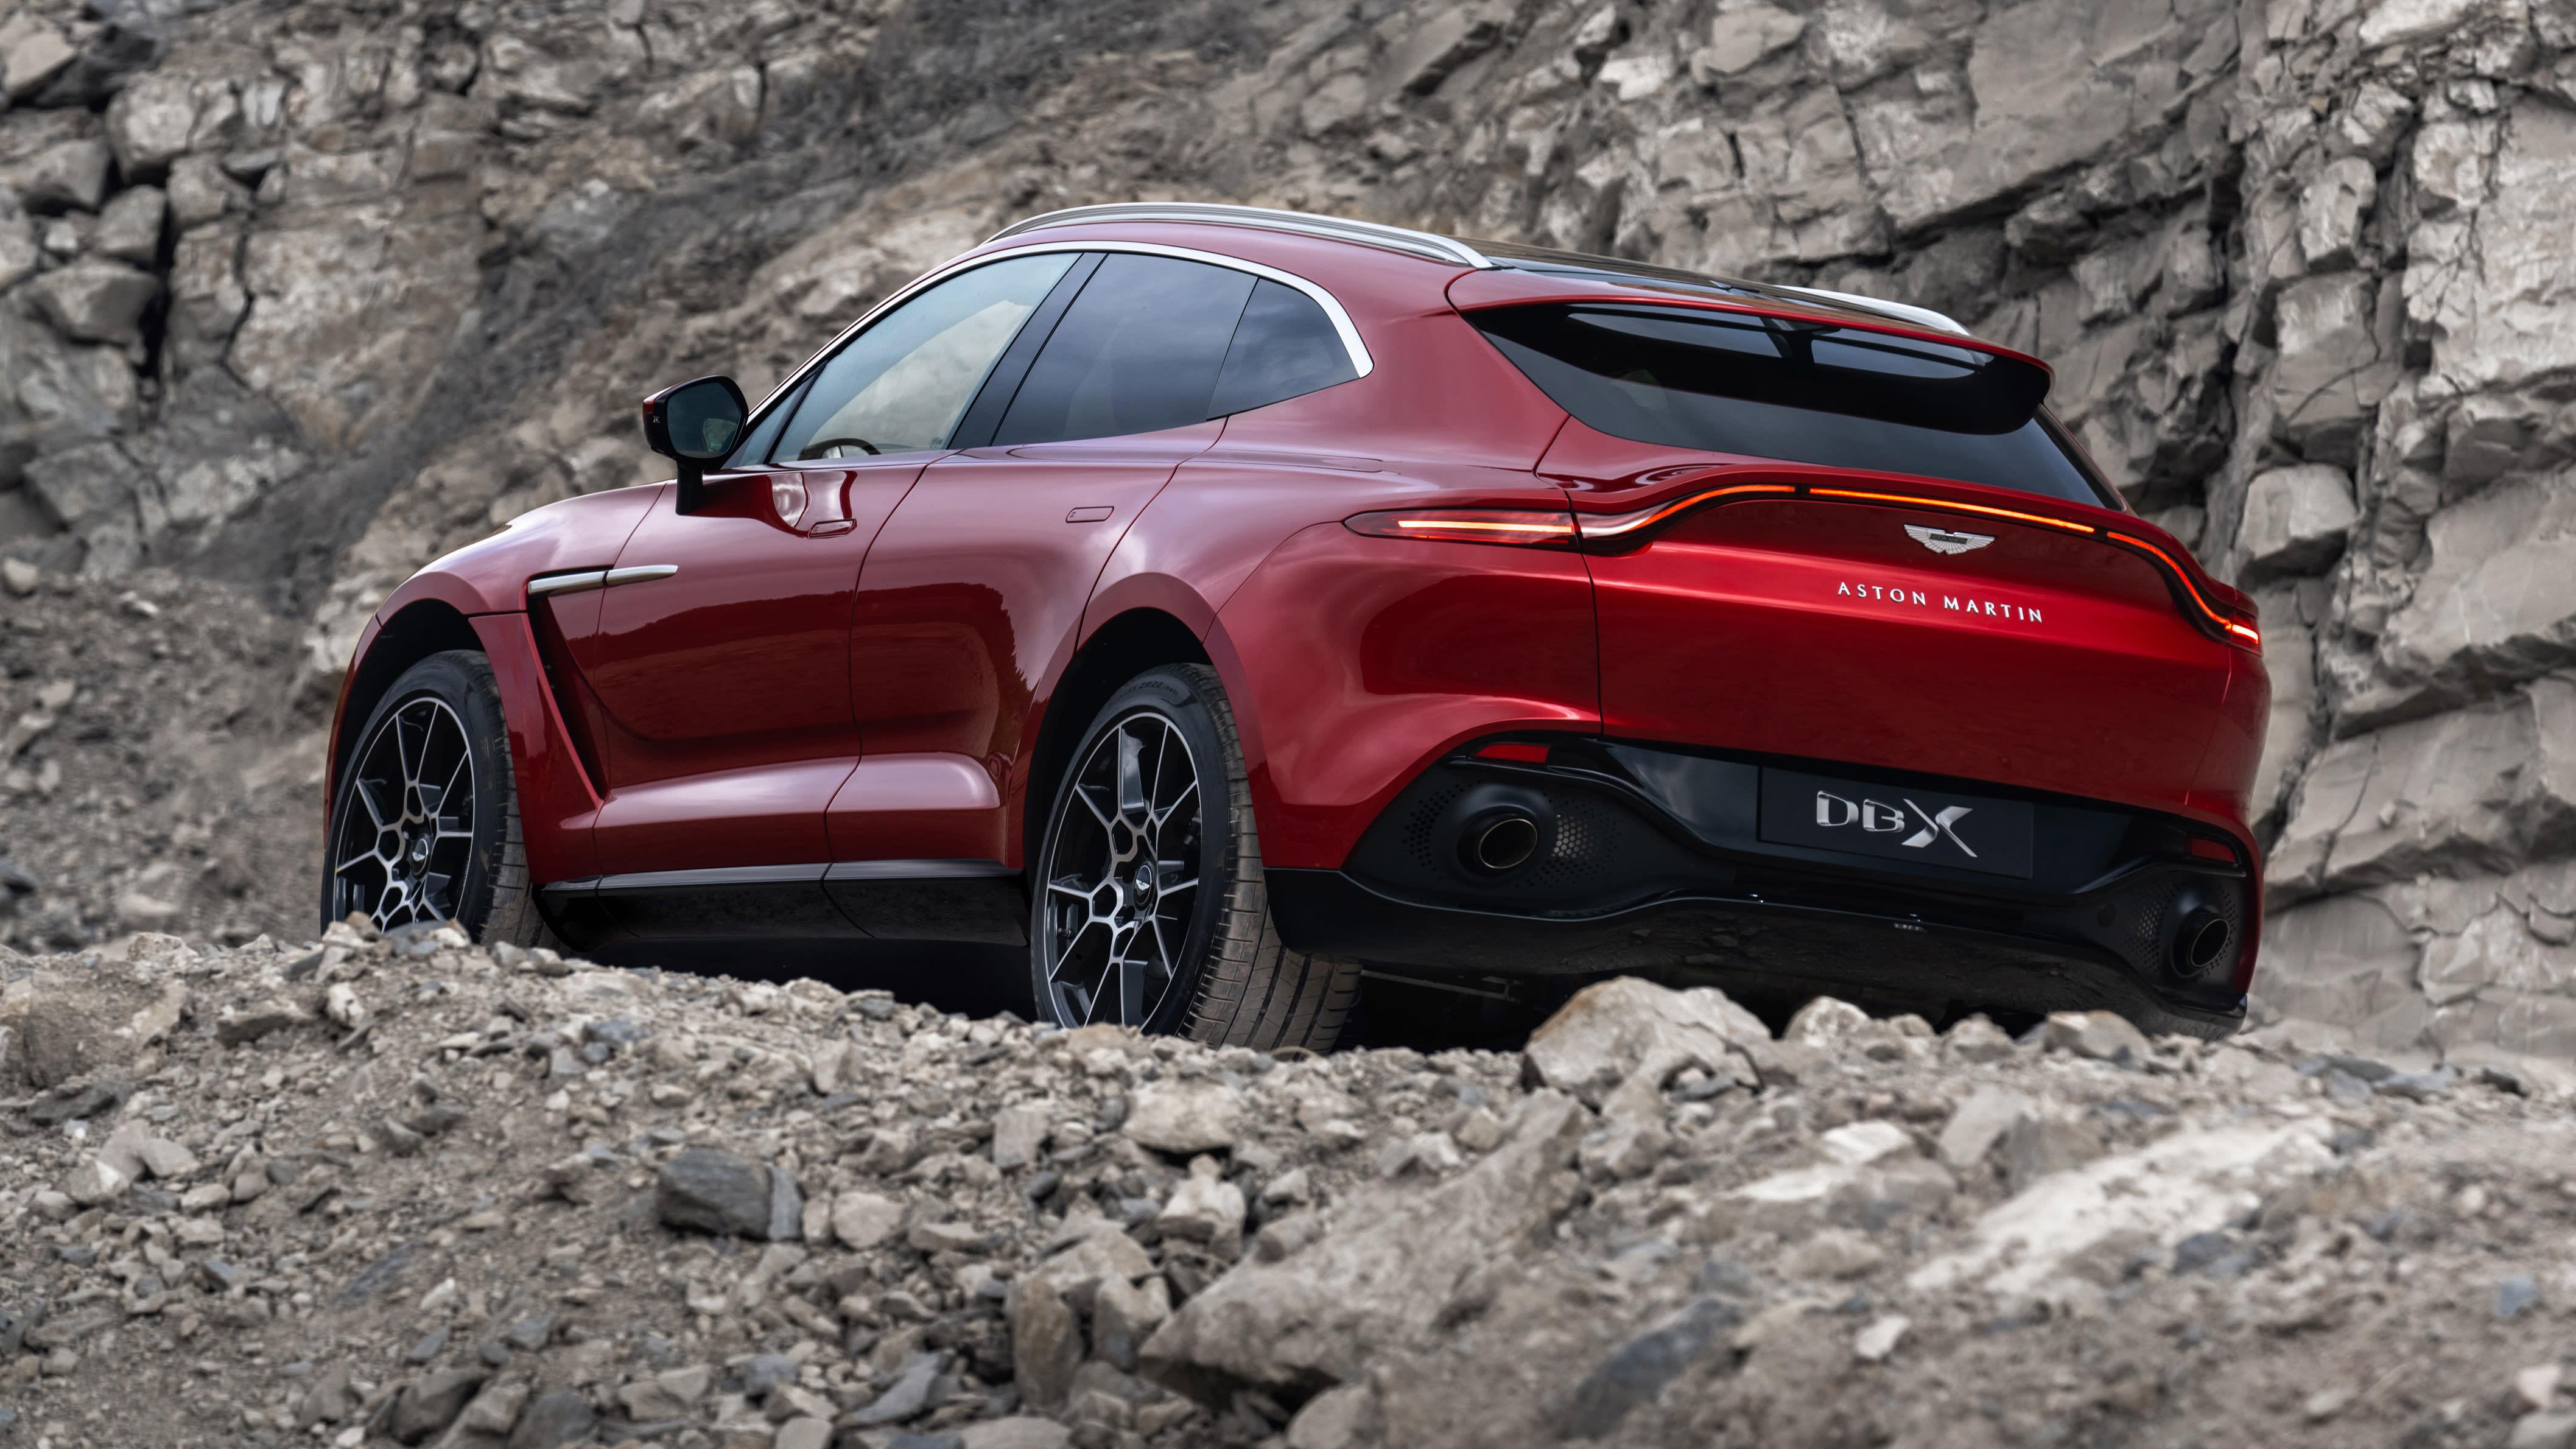 2020 Aston Martin Dbx Revealed Australian Launch Due Next Year Caradvice